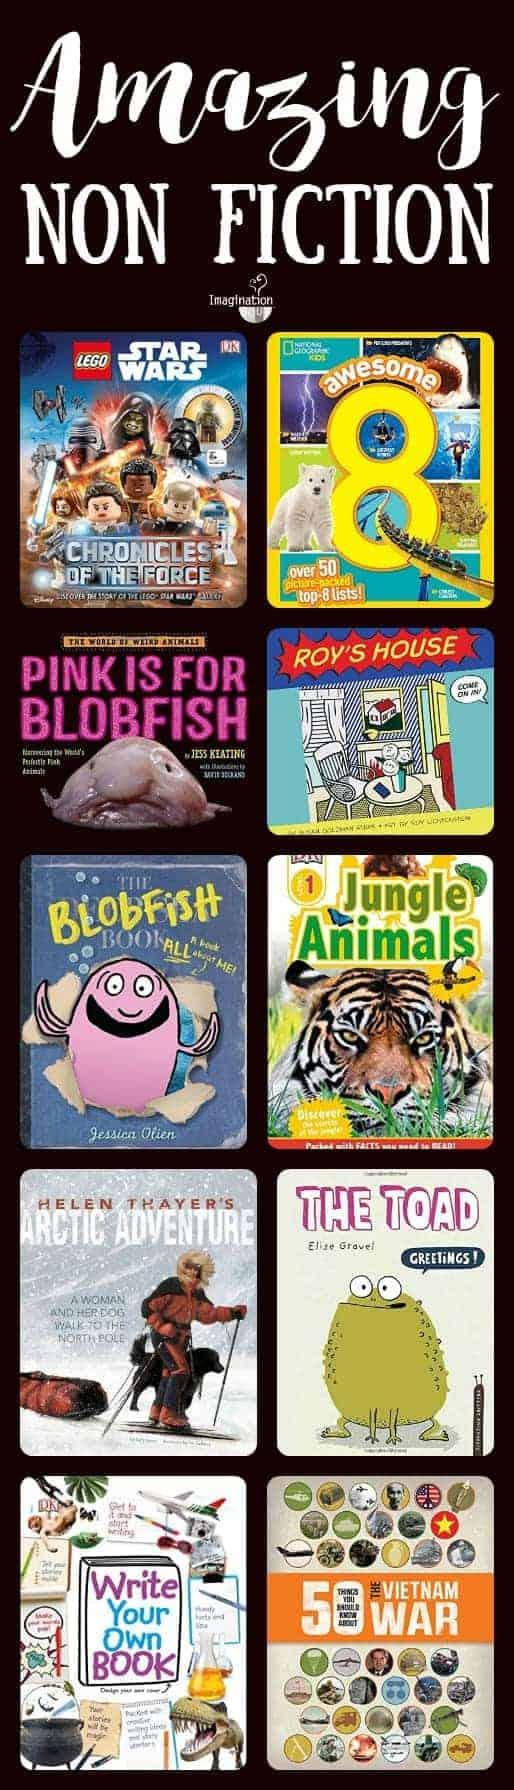 amazing non fiction children's book